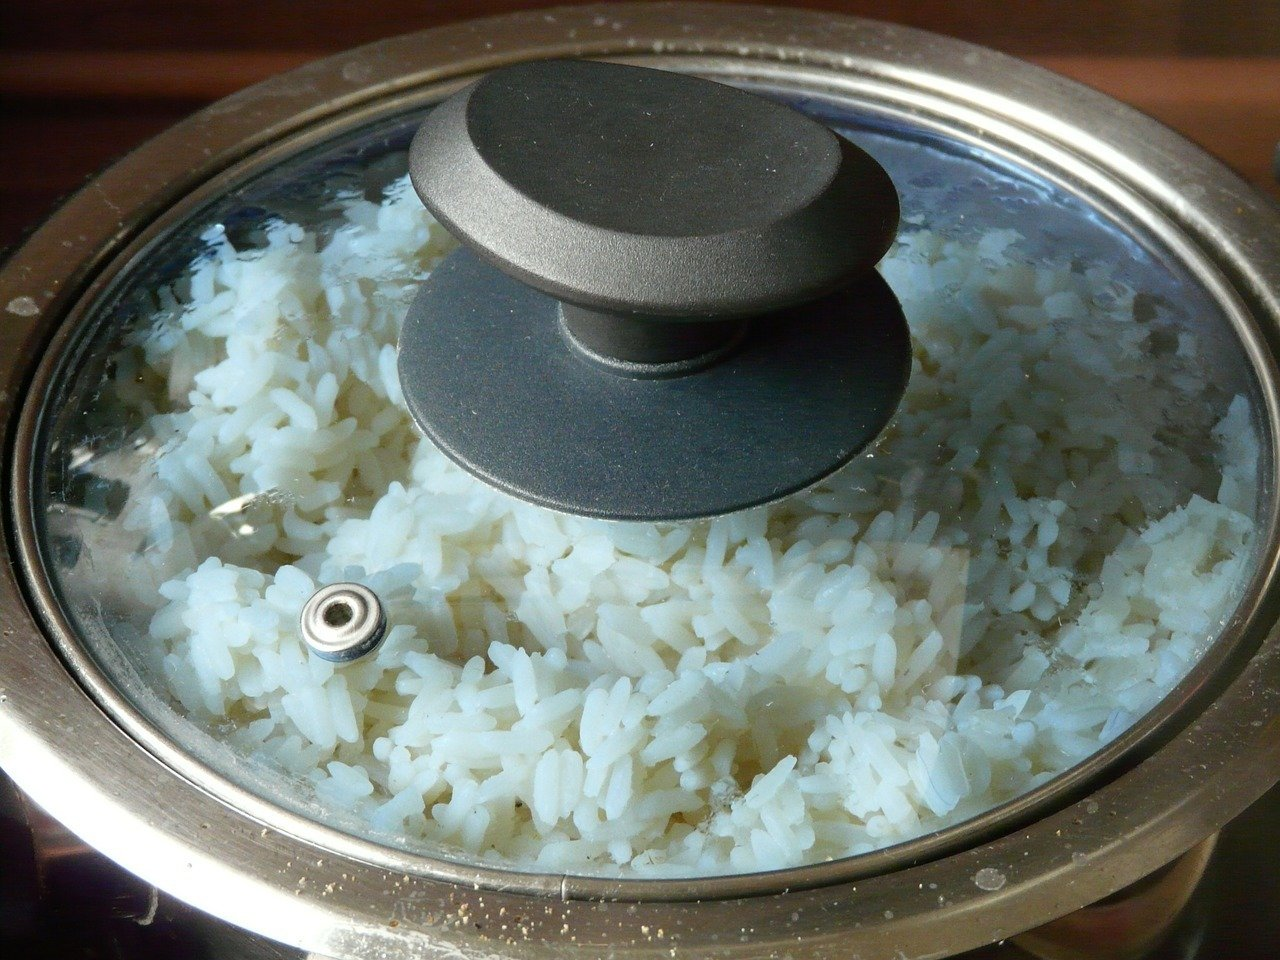 Reis kochen so gelingt dein reis perfekt - Reis kochen quellmethode ...